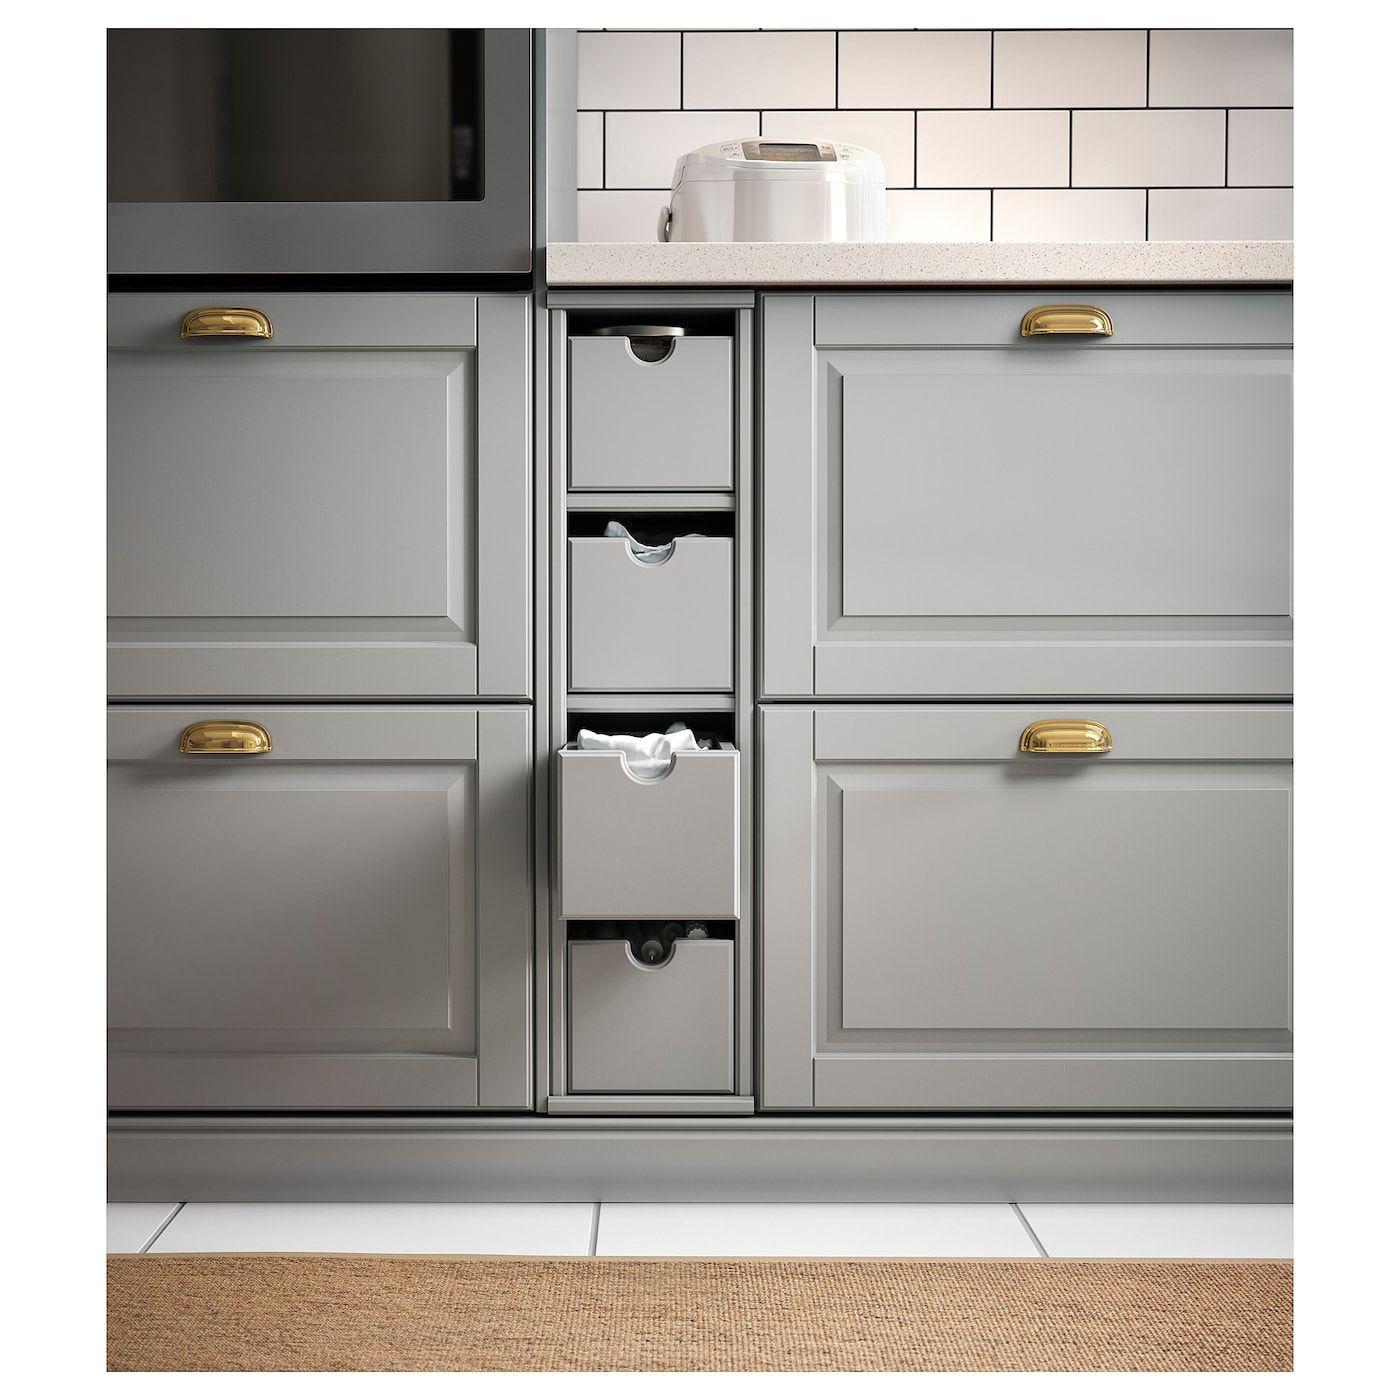 Tornviken Box Grau Ikea Osterreich In 2020 Grey Ikea Kitchen Ikea Kitchen Cabinets Ikea Kitchen